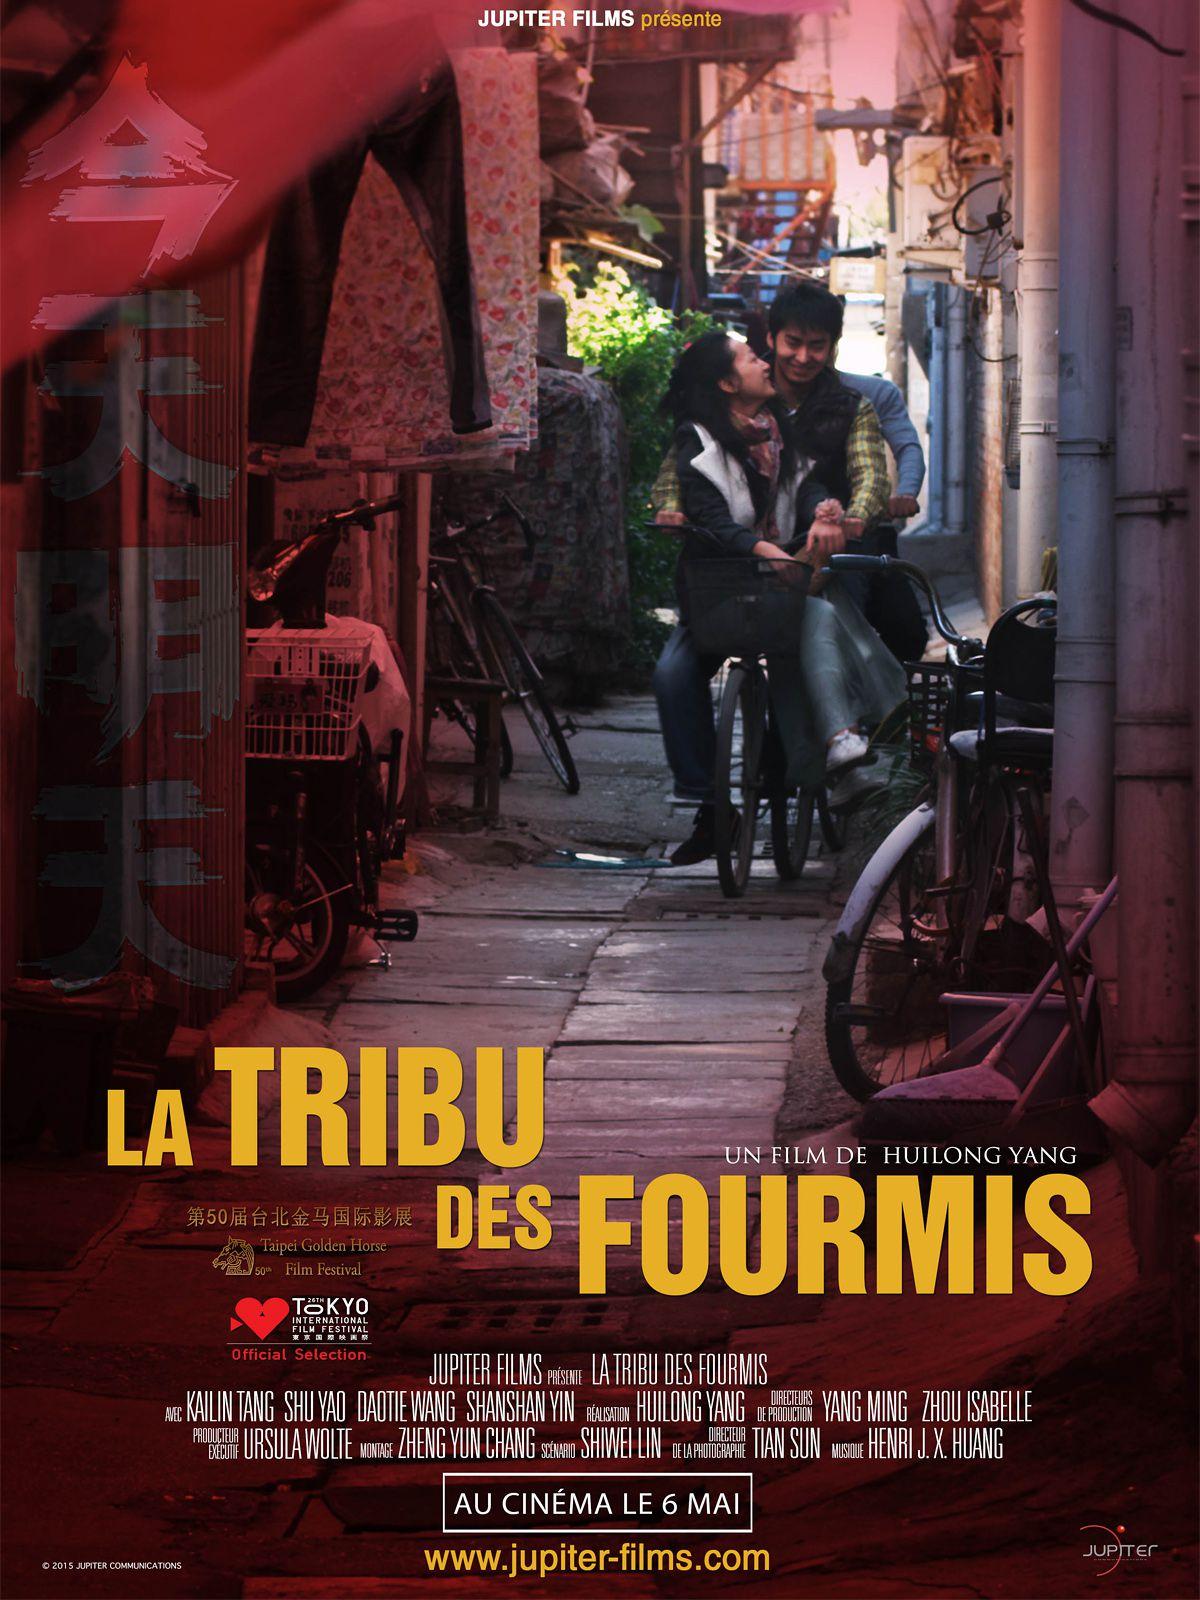 La Tribu des fourmis - Film (2015)